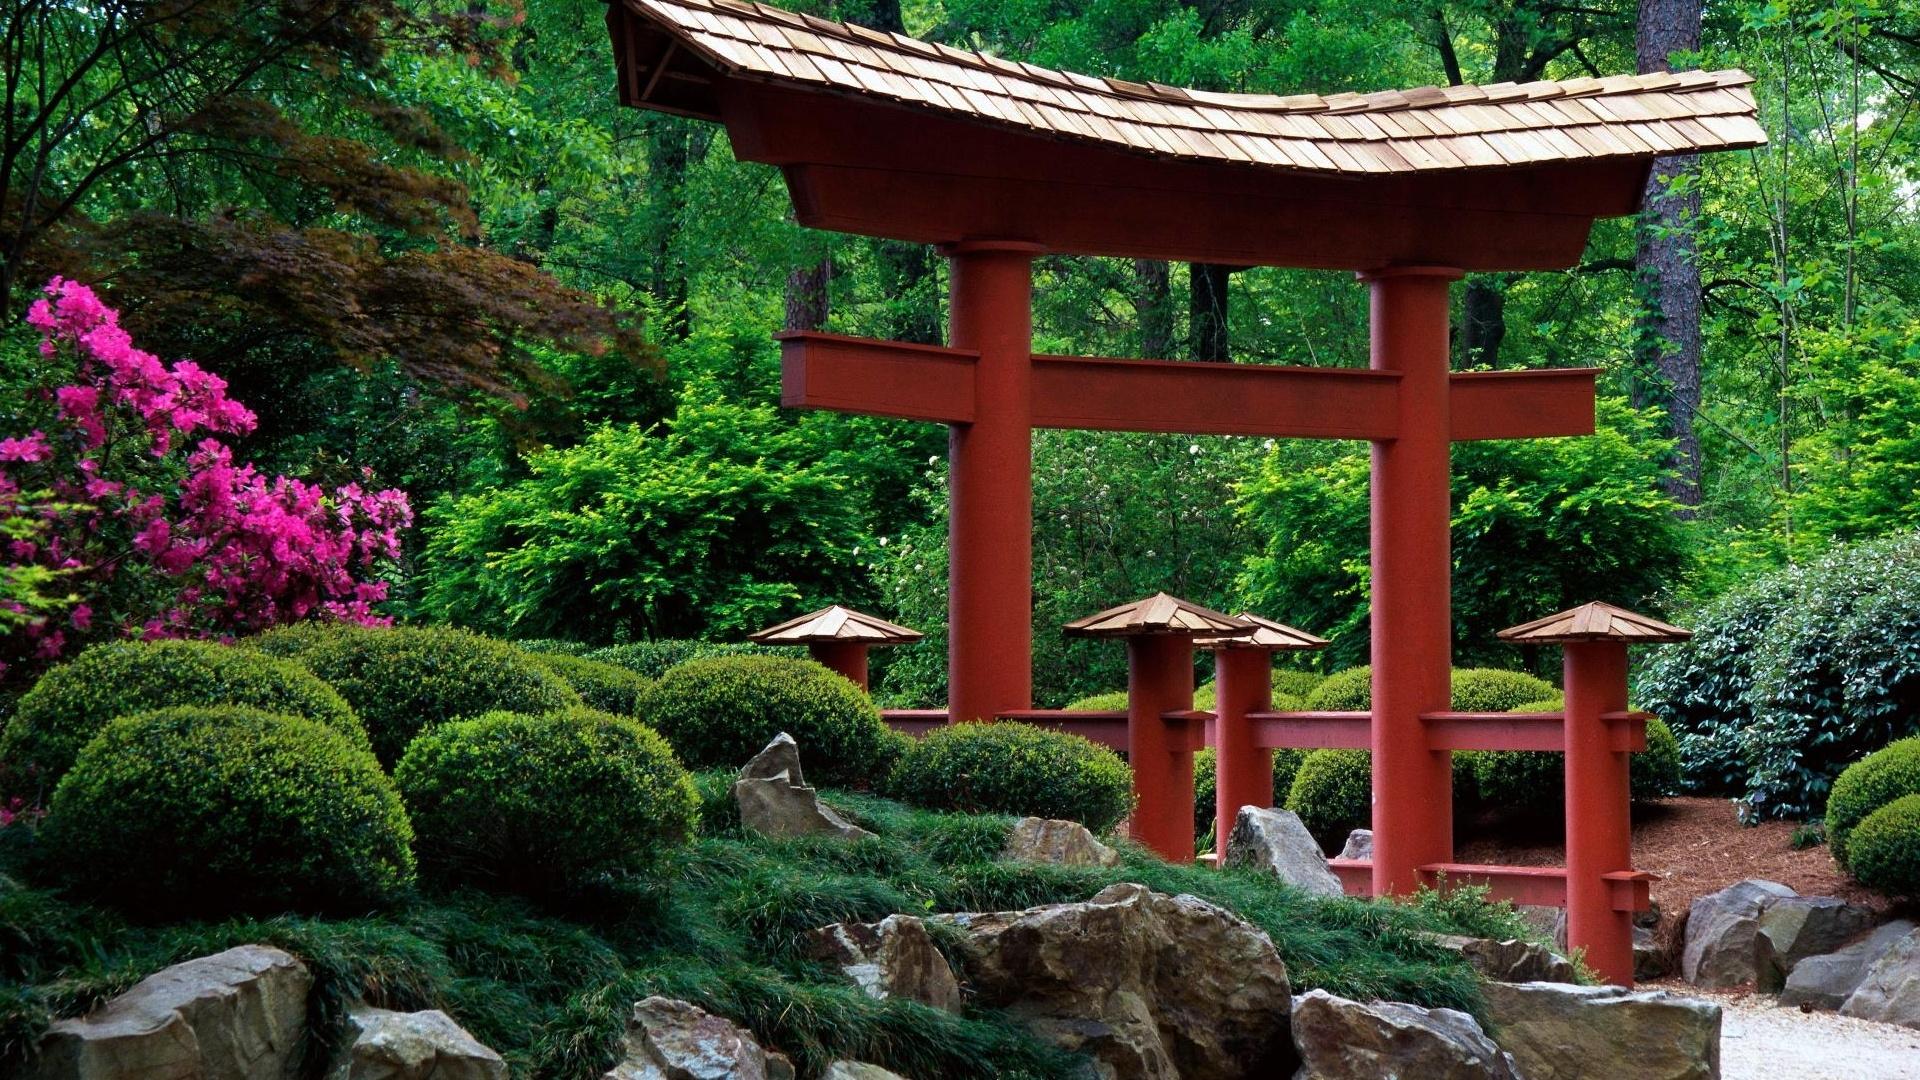 Nature Beautiful garden in the Japanese style HD Desktop Wallpaper 1920x1080